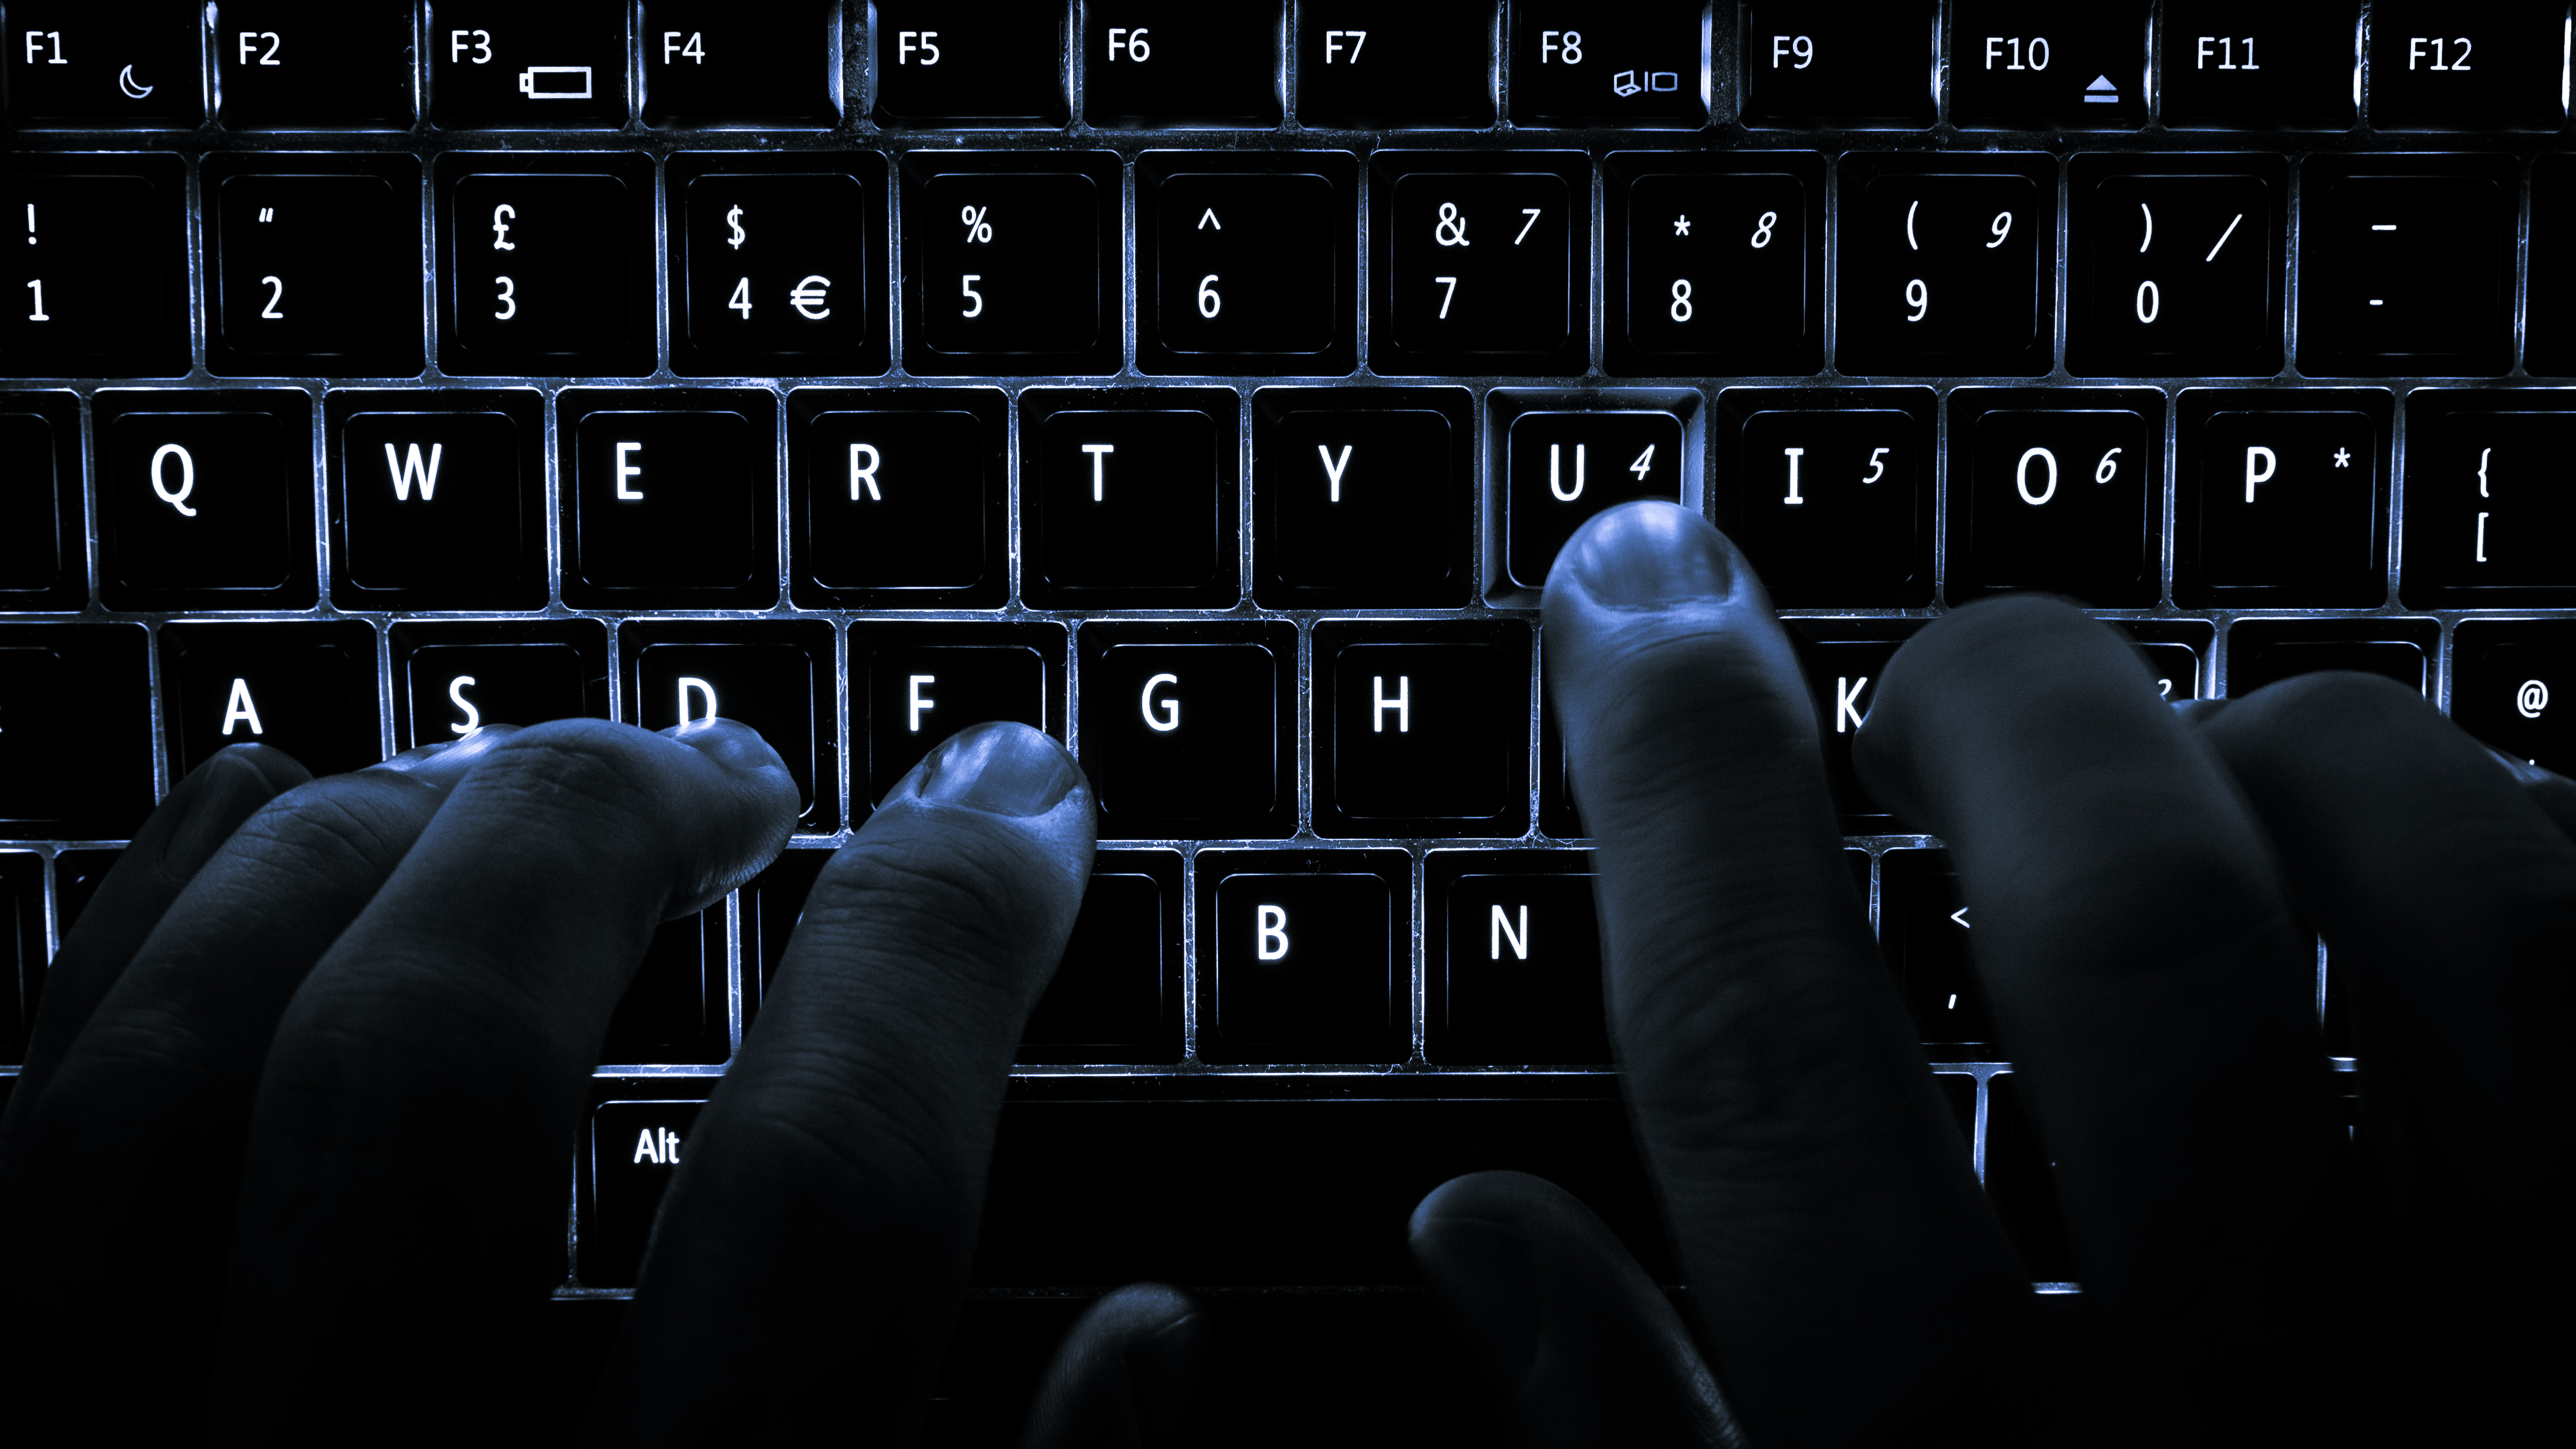 Backlit keyboard, Credit: Wikimedia Commons